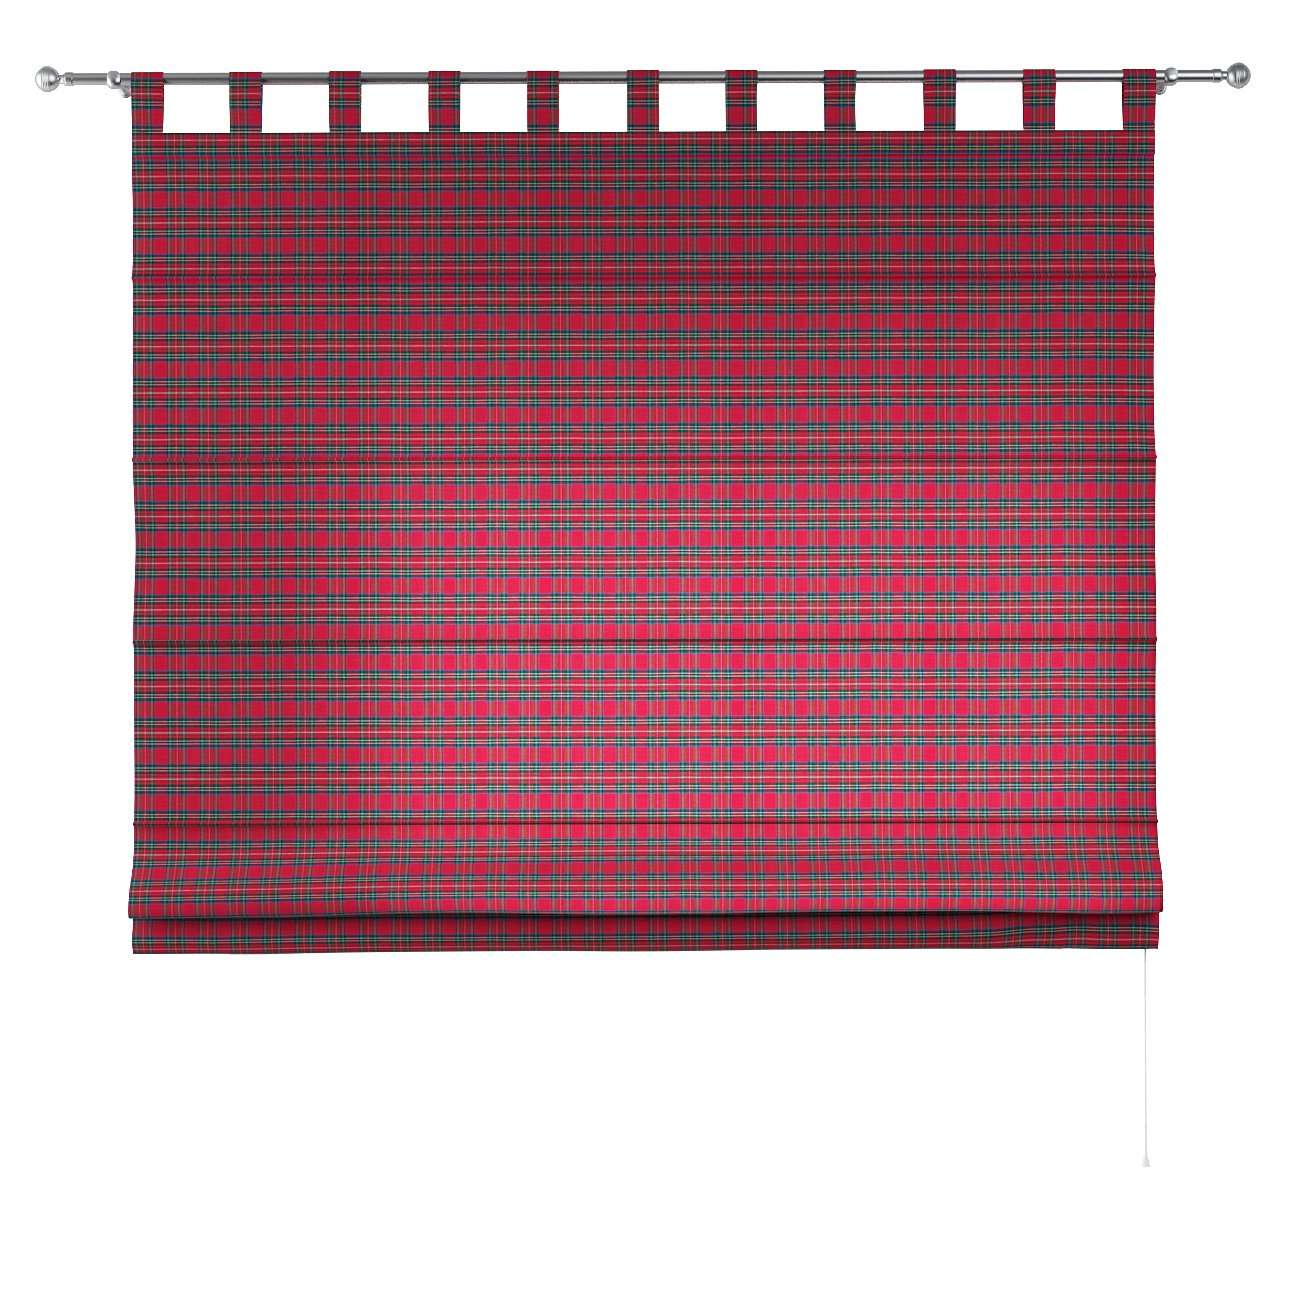 Verona tab top roman blind 80 x 170 cm (31.5 x 67 inch) in collection Bristol, fabric: 126-29